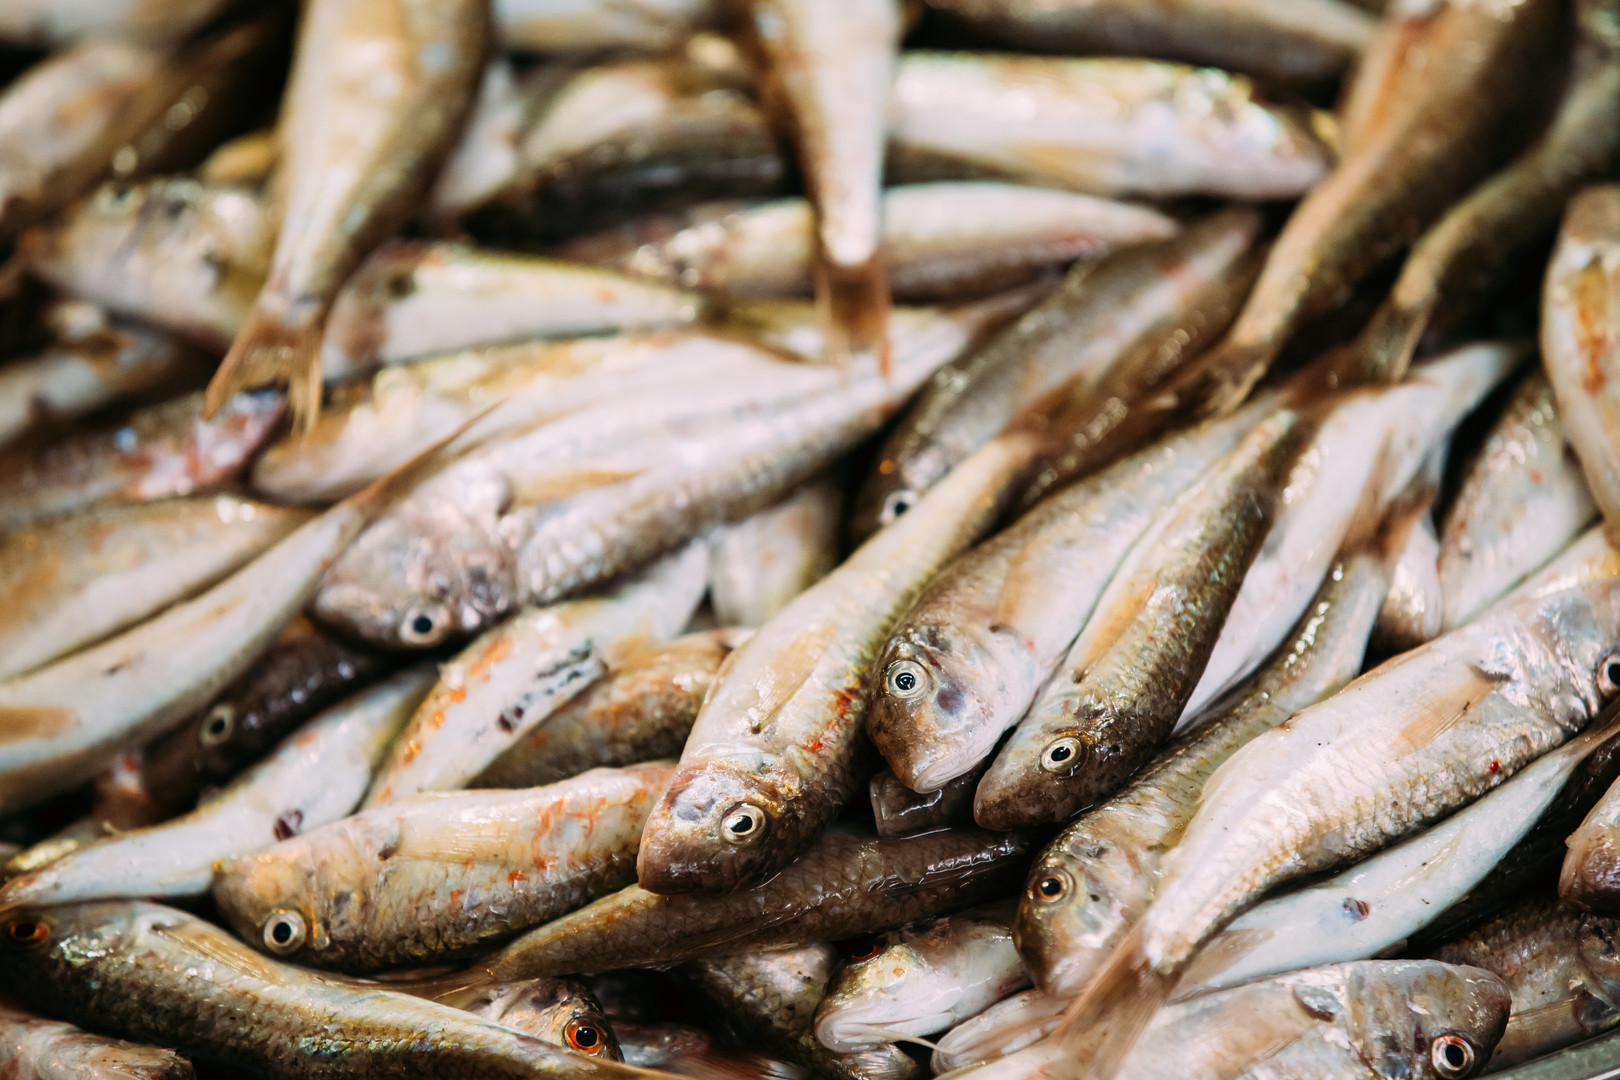 OYSTER BAR VERNON fresh-fish-on-display-